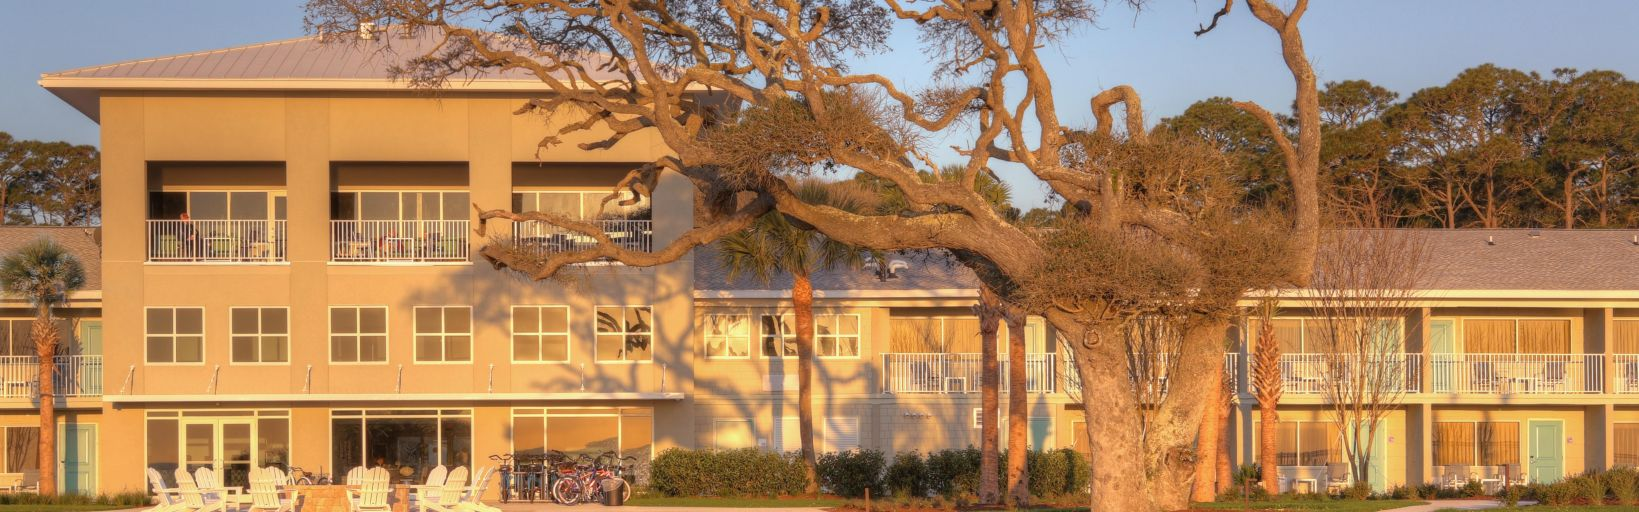 Sweeping Majestic Live Oak At Holiday Inn Resort Jekyll Island